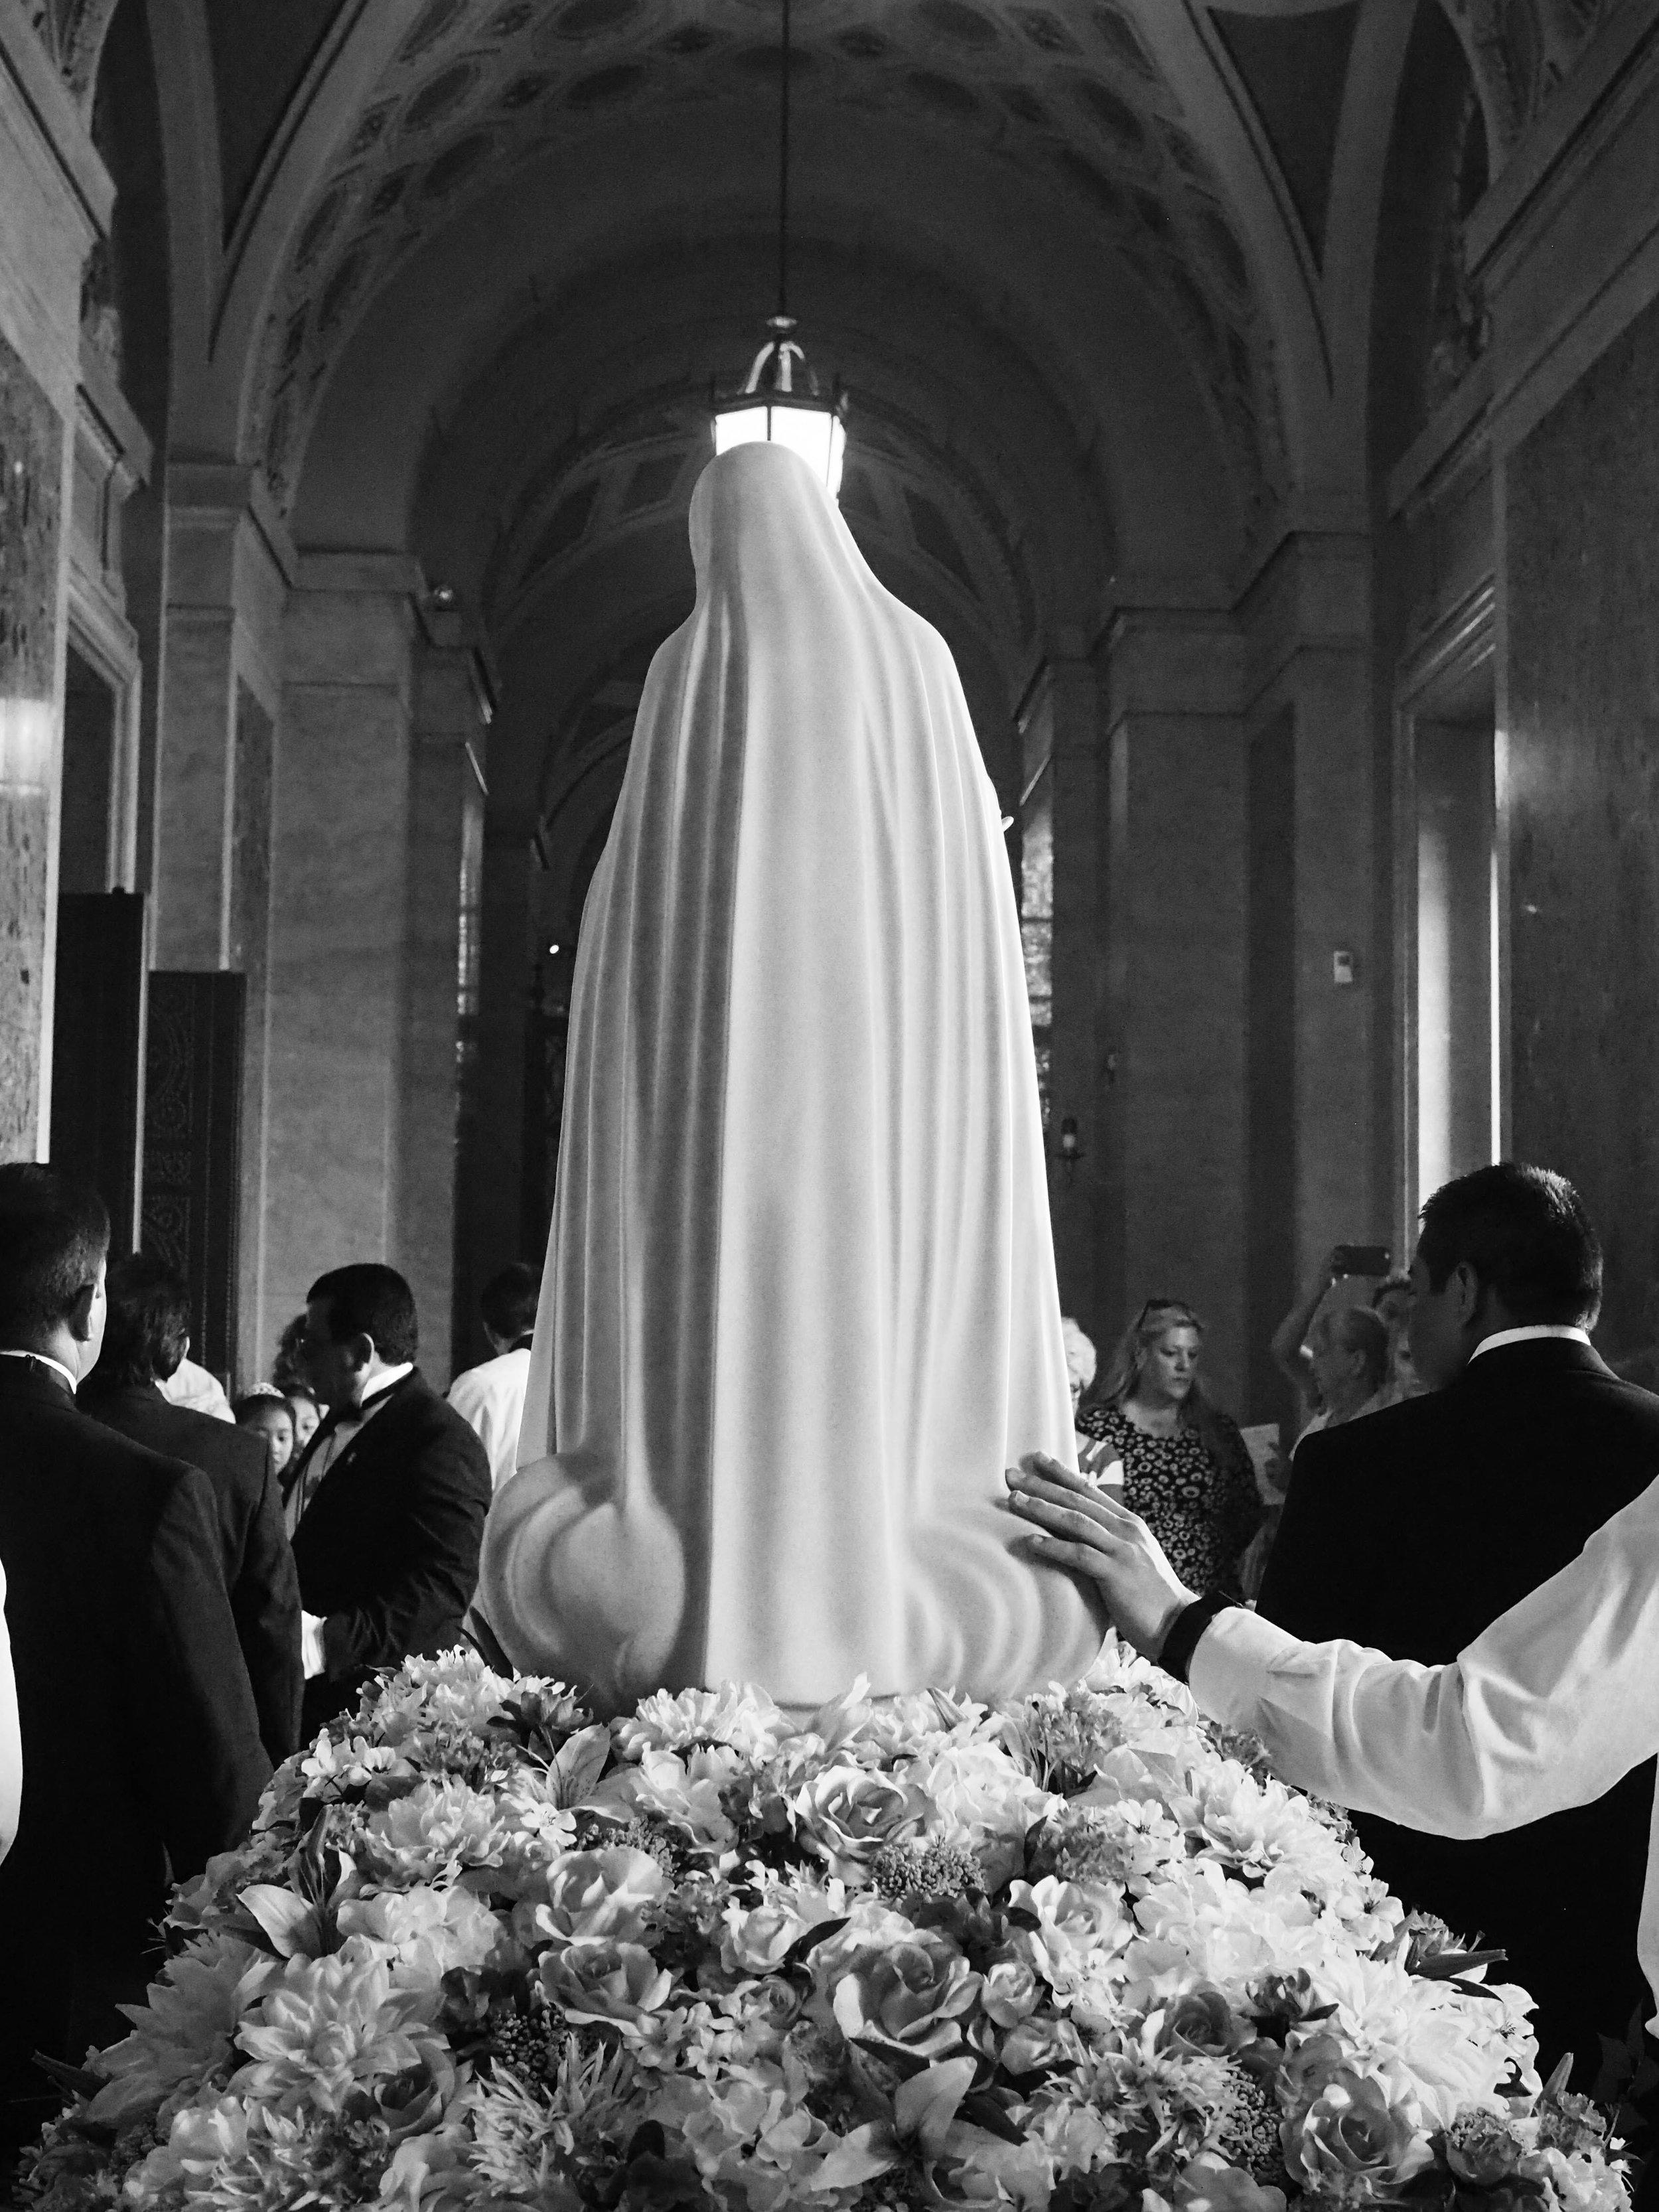 Hand on Mary. Rosary Procession. Saint Paul, MN.